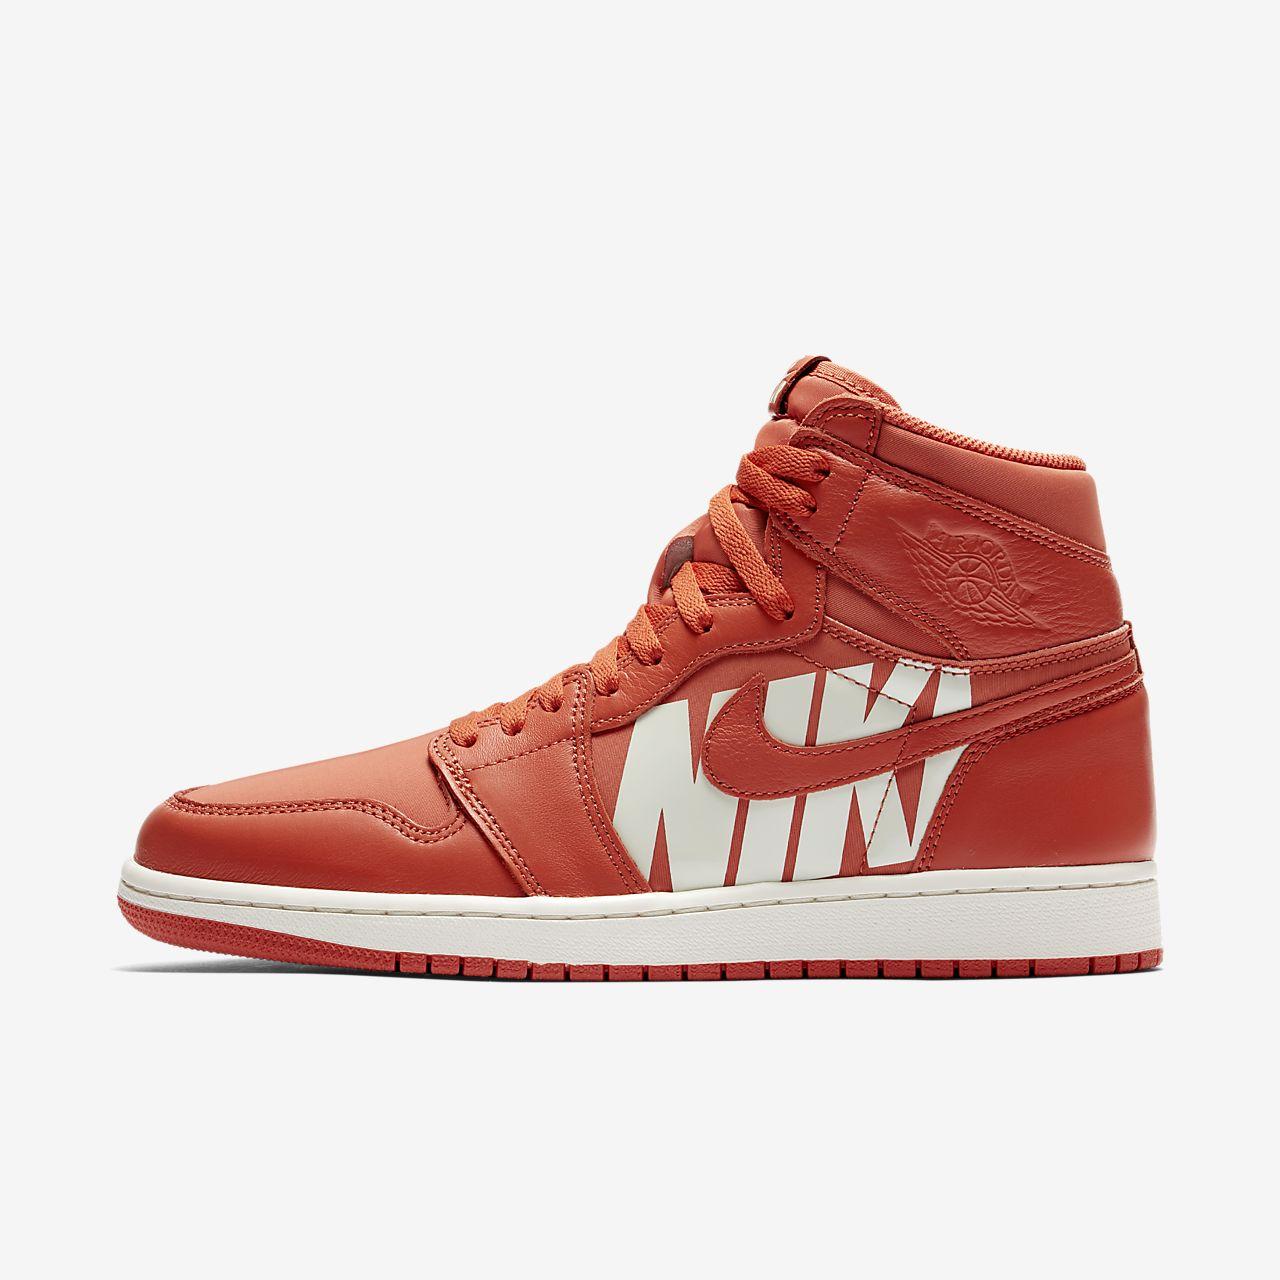 size 40 3e073 4970c ... Chaussure Air Jordan 1 Retro High OG